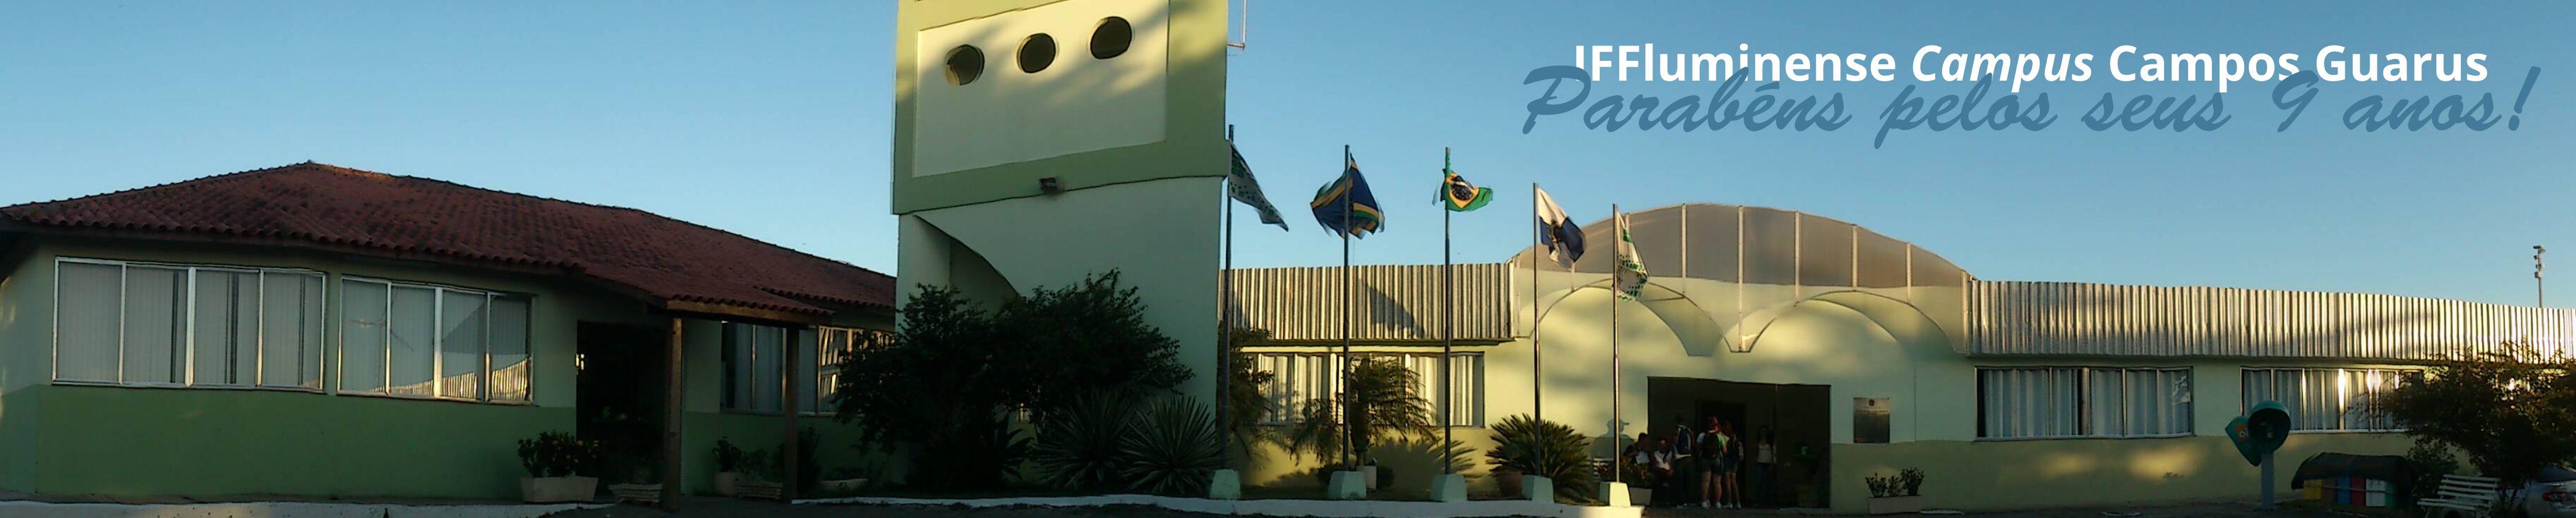 Banner aniversário do Campus Guarus - 9 anos